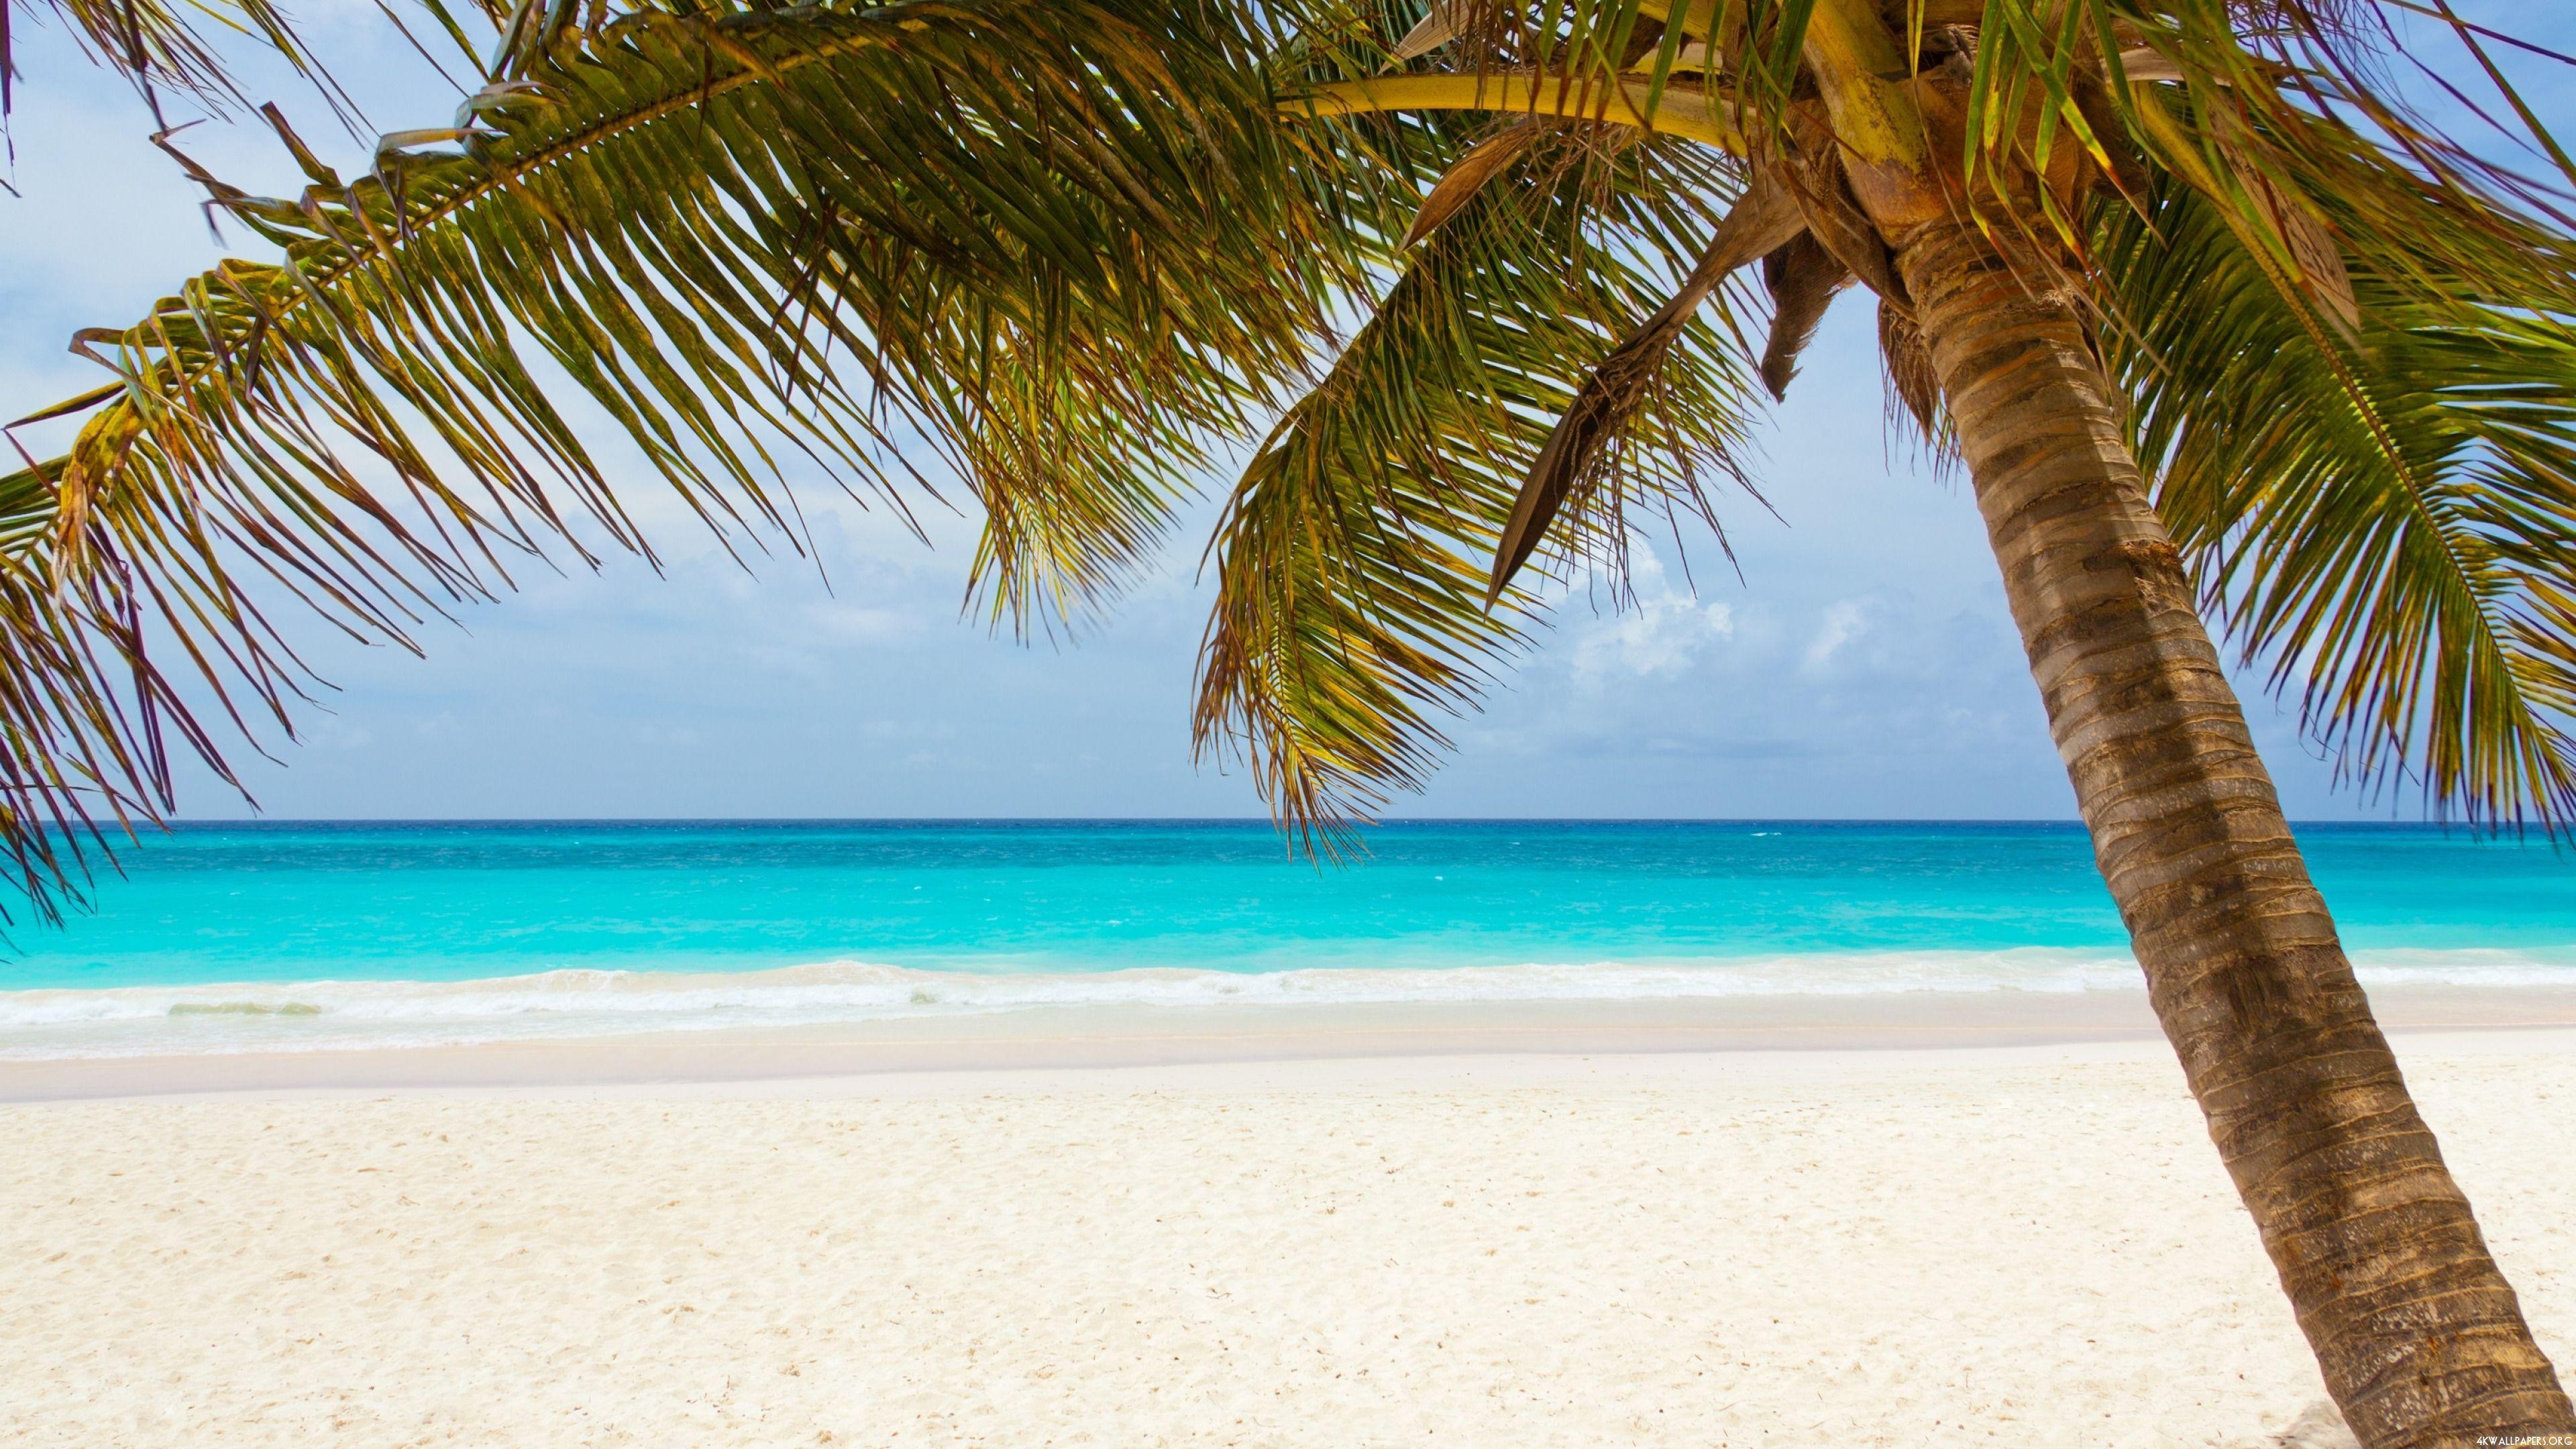 3840X2160 Beach Wallpapers - Top Free 3840X2160 Beach ...